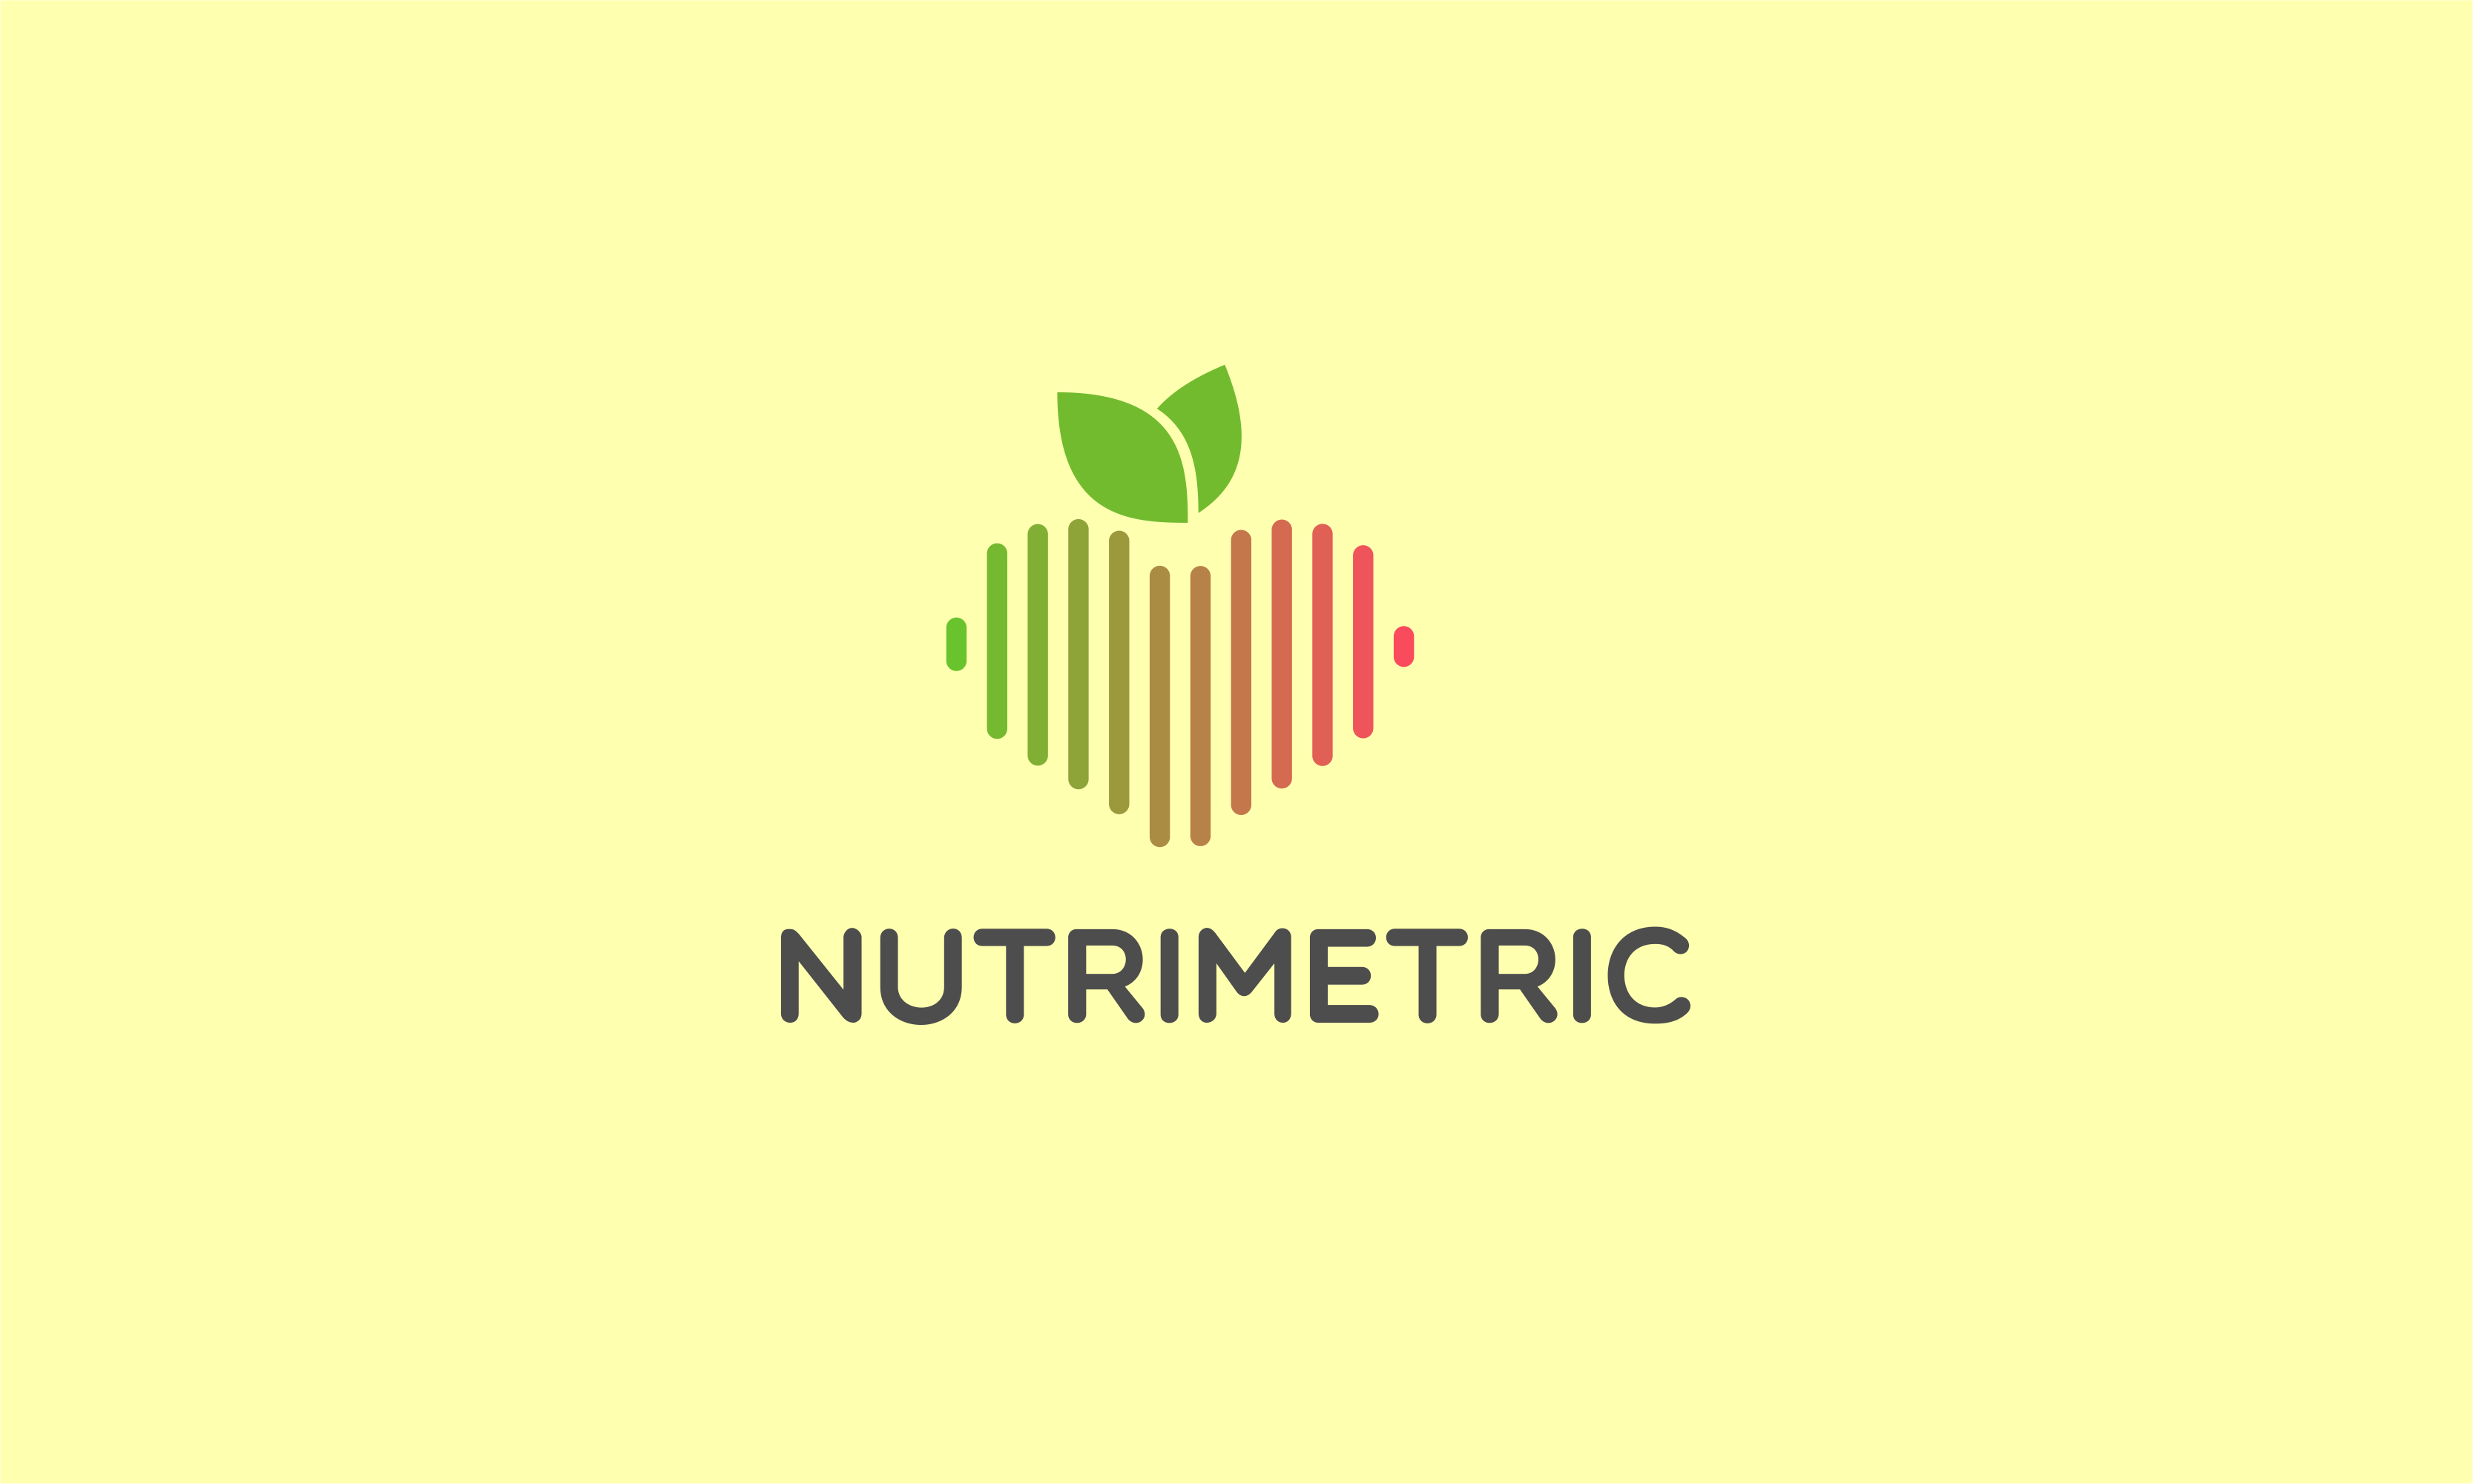 Nutrimetric